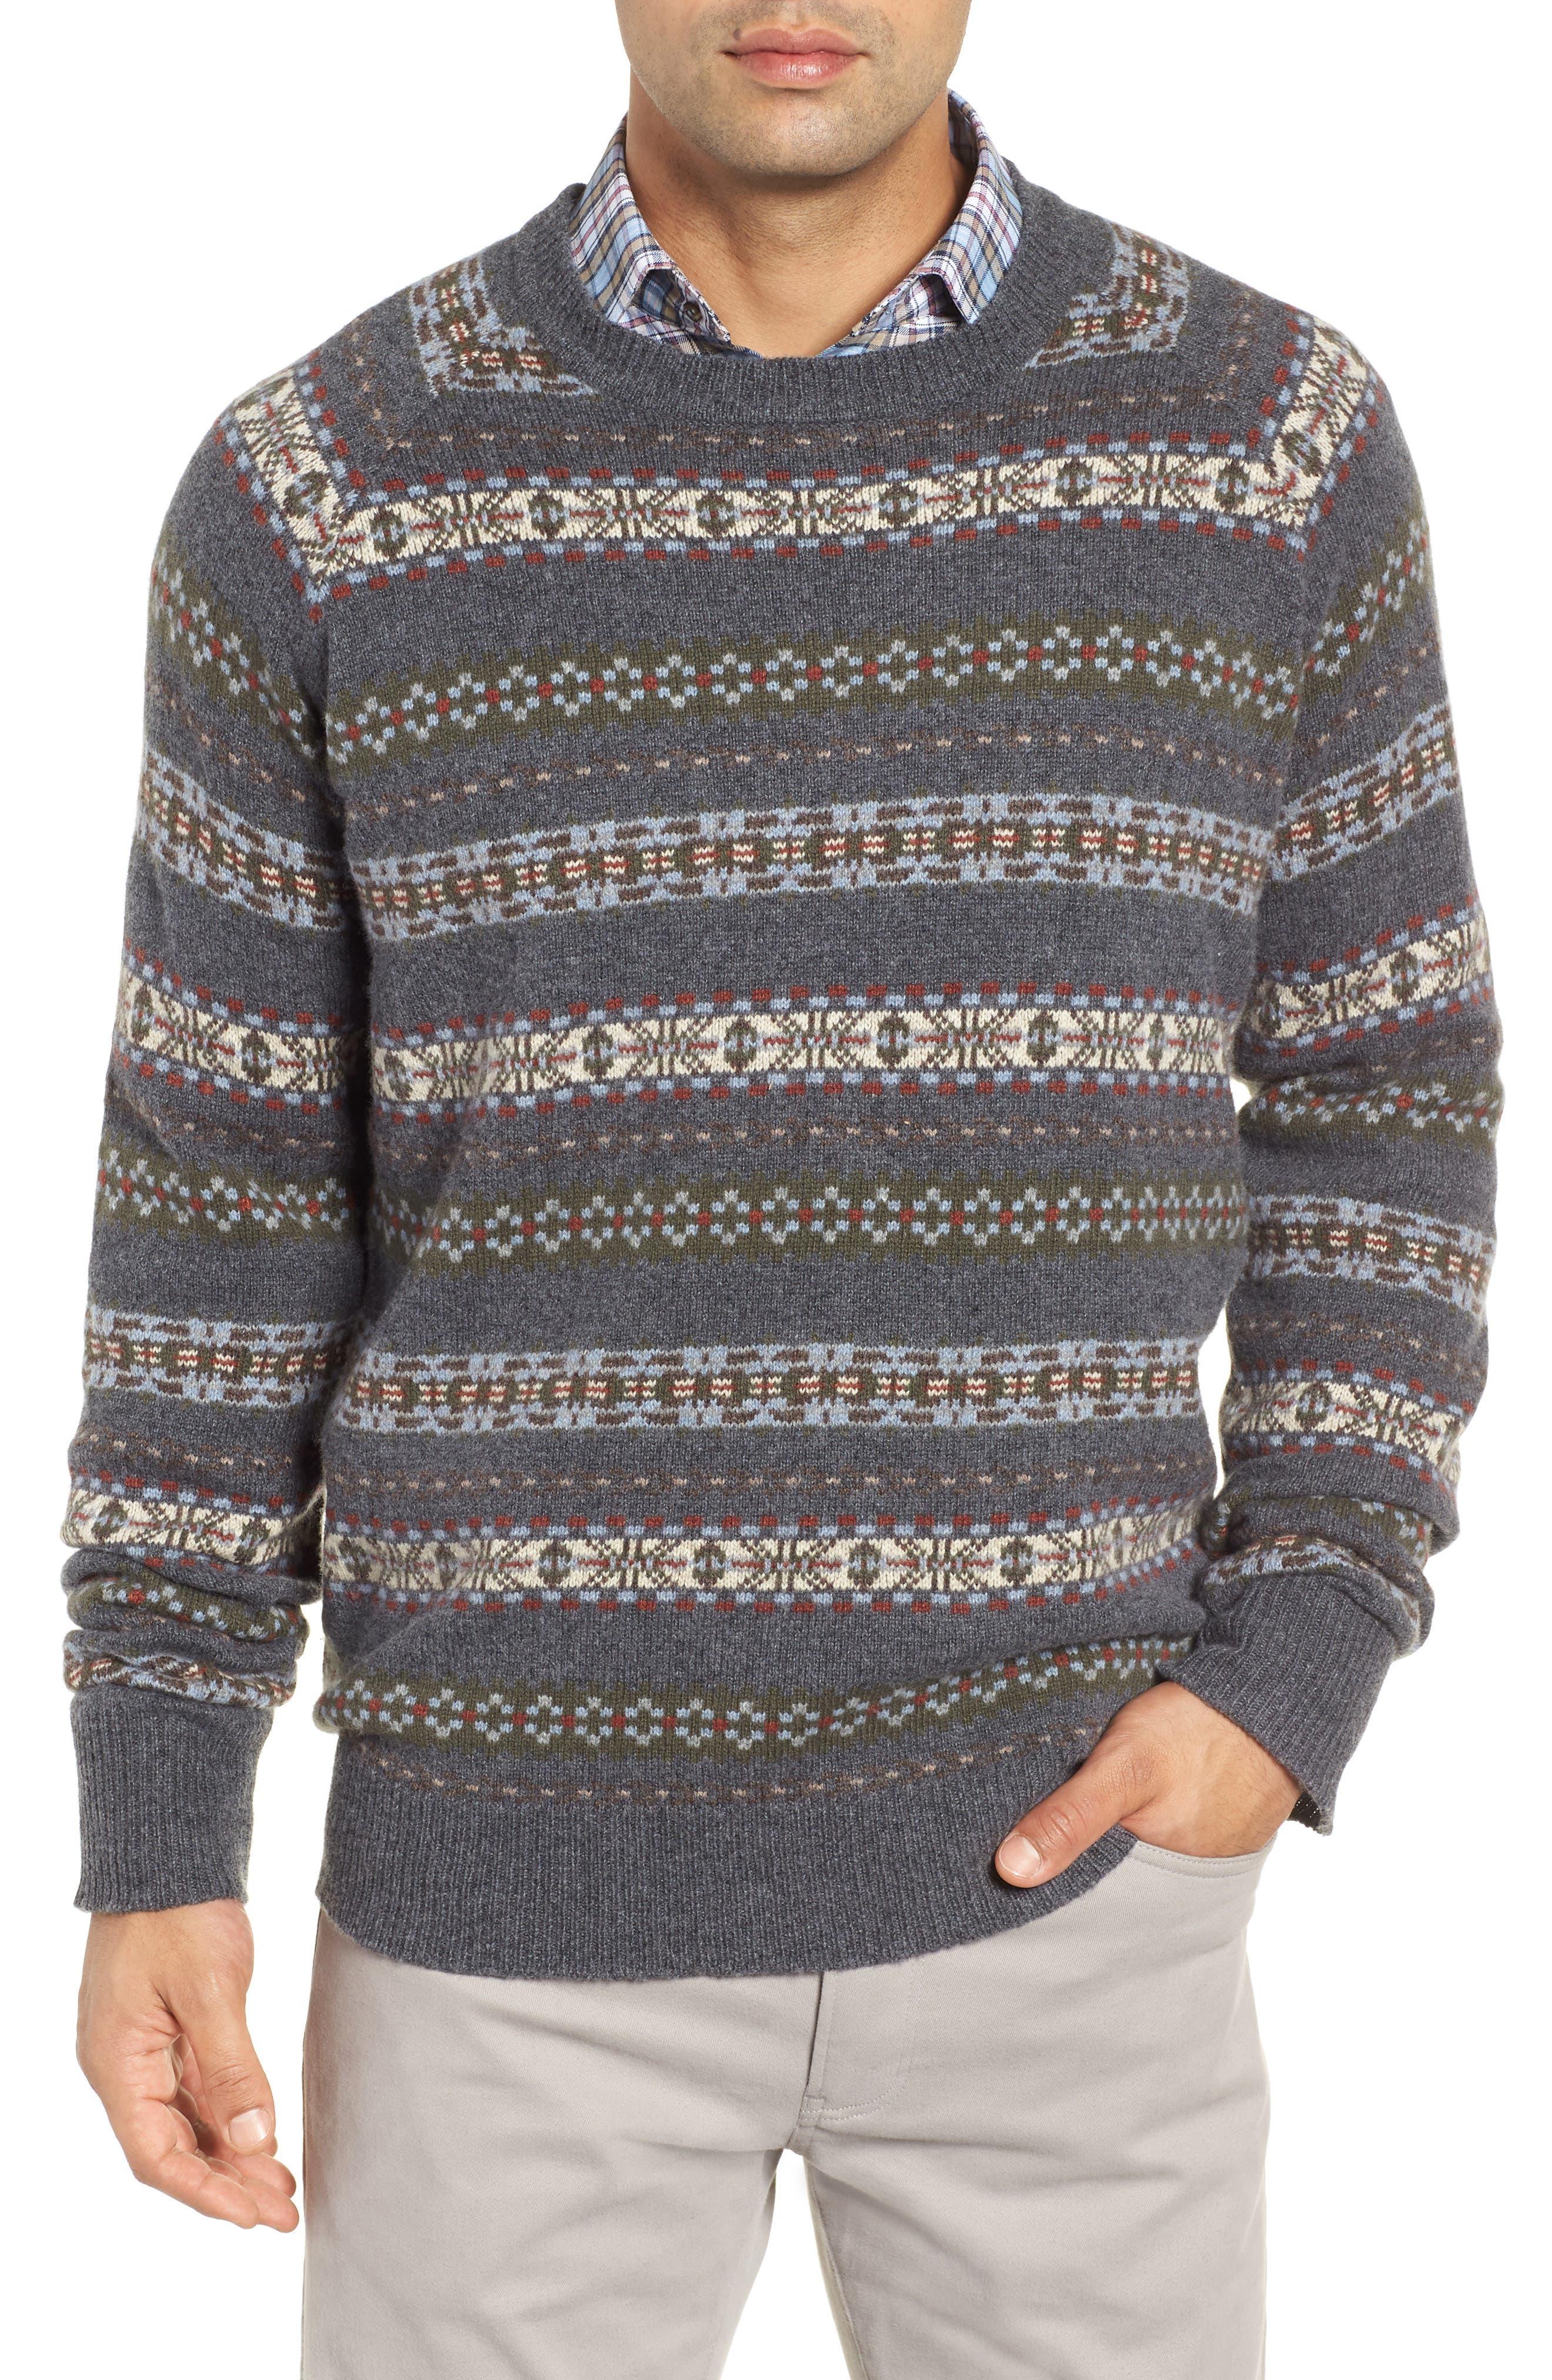 Mountainside Fair Isle Crewneck Sweater,                         Main,                         color, Black